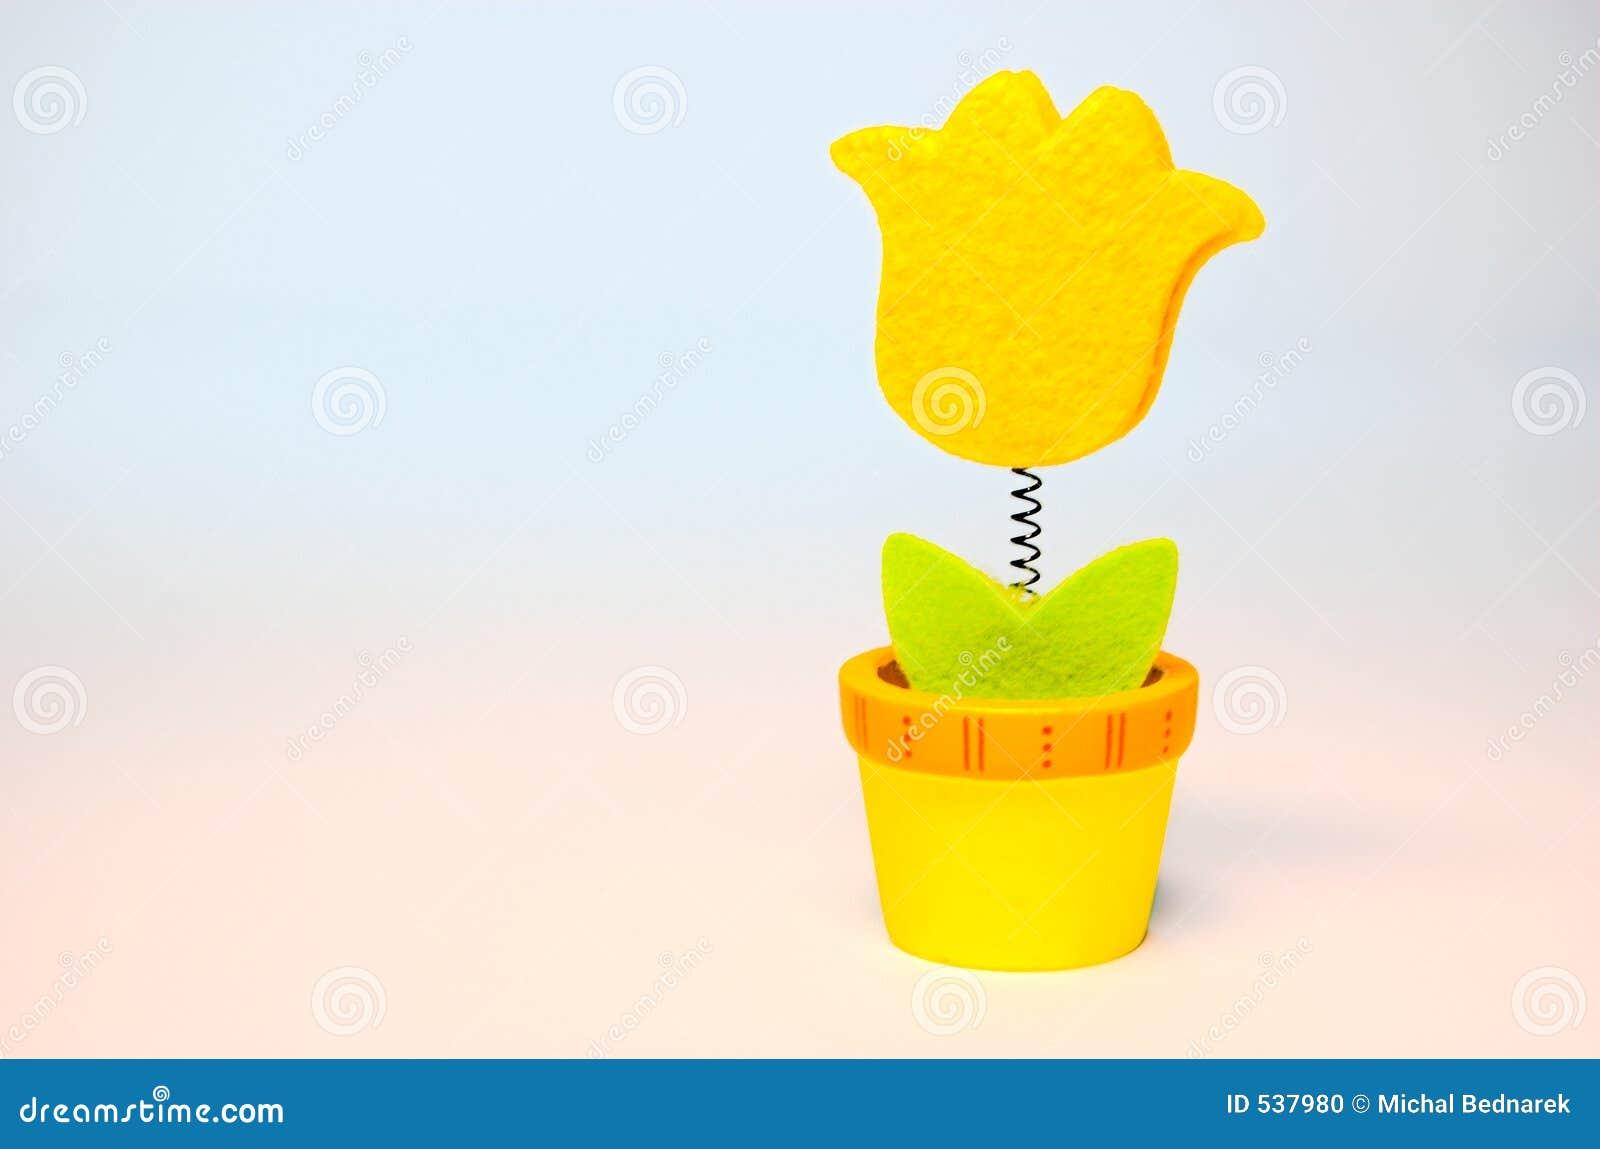 Download 花玩具 库存照片. 图片 包括有 伪造品, 愉快, 笑话, 作用, 橙色, 详细资料, 玩具, 春天, 黄色 - 537980